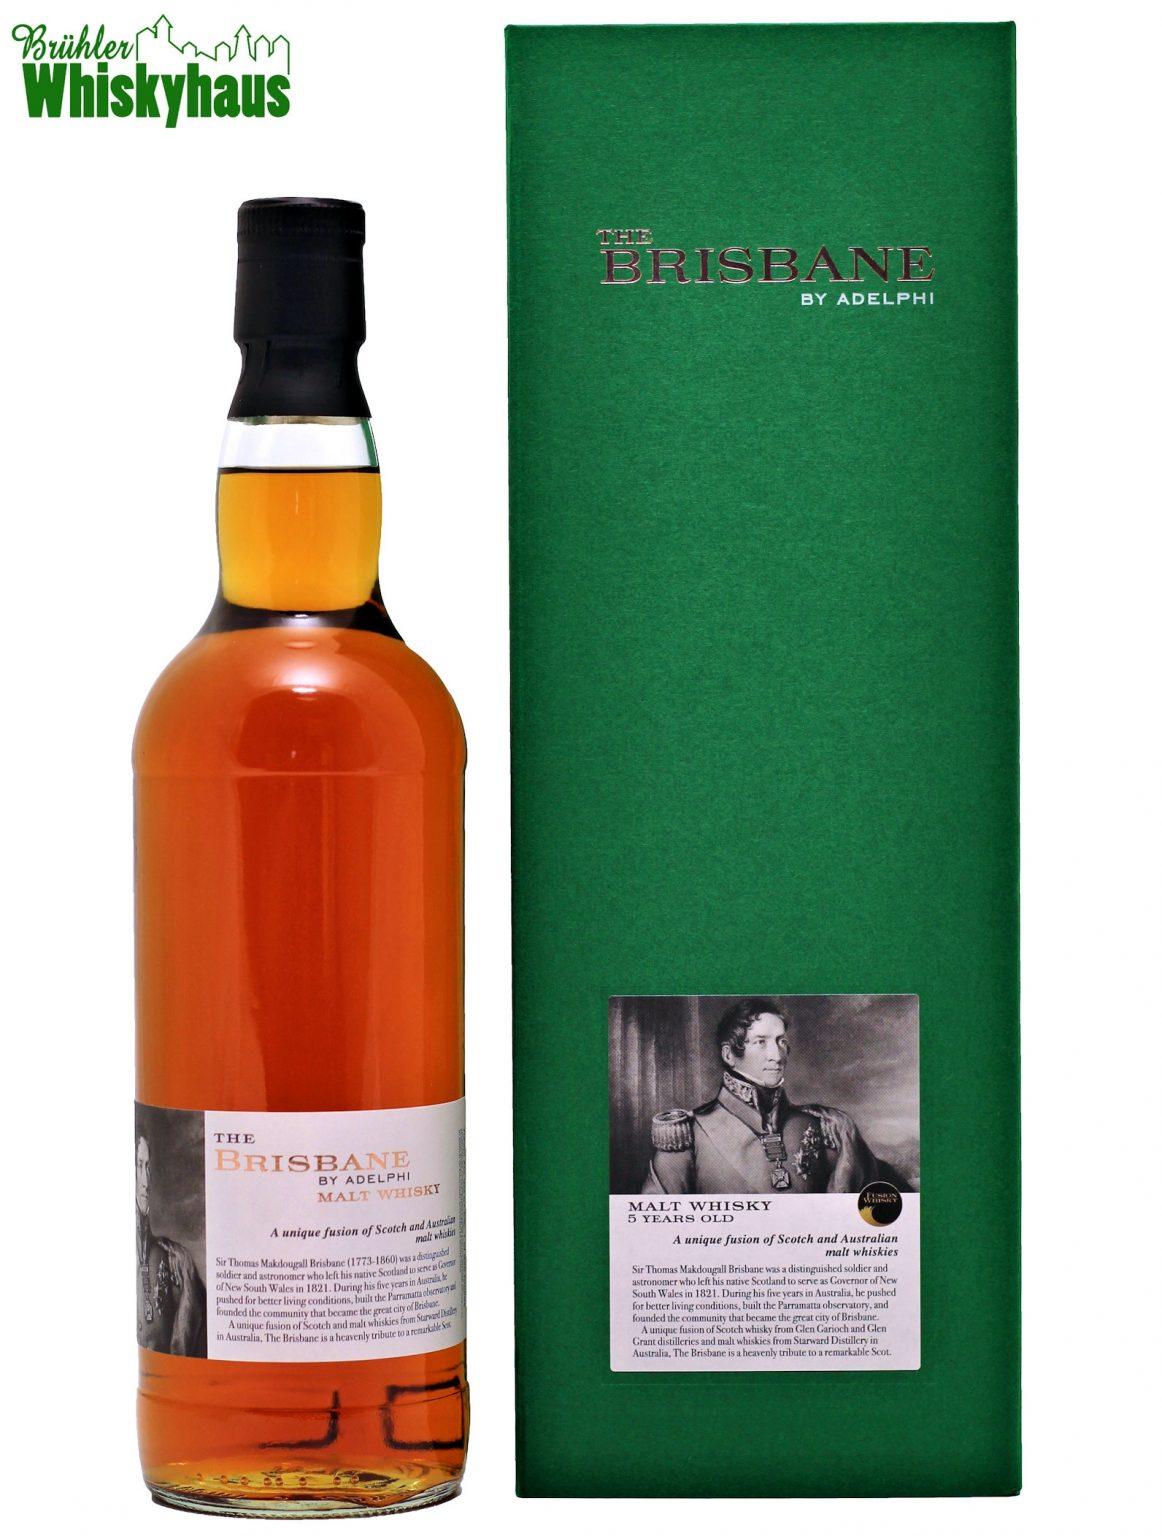 Adelphi 5 Jahre - The Brisbane - A Unique Fusion of Scotch and Australian Malt Whisky